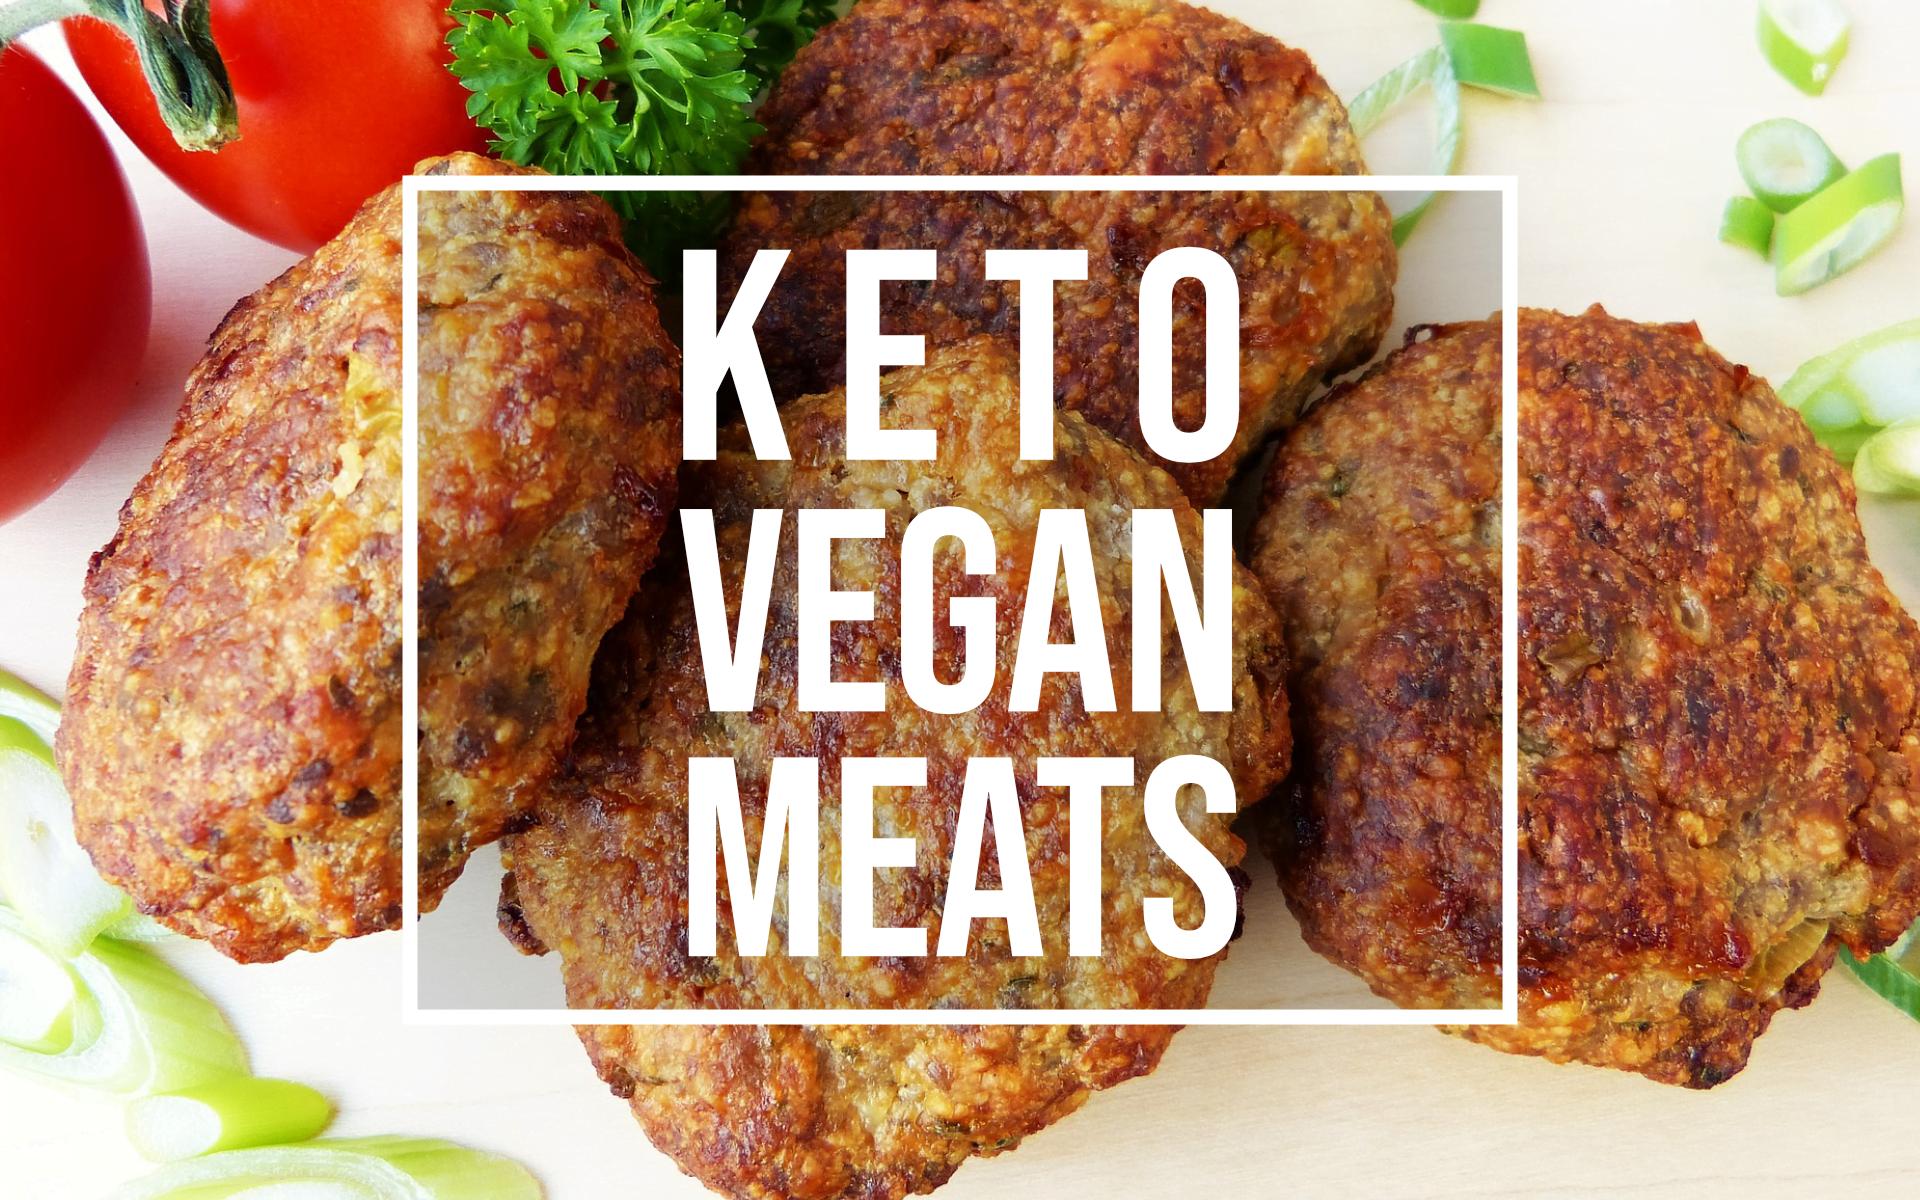 keto vegan meat alternatives